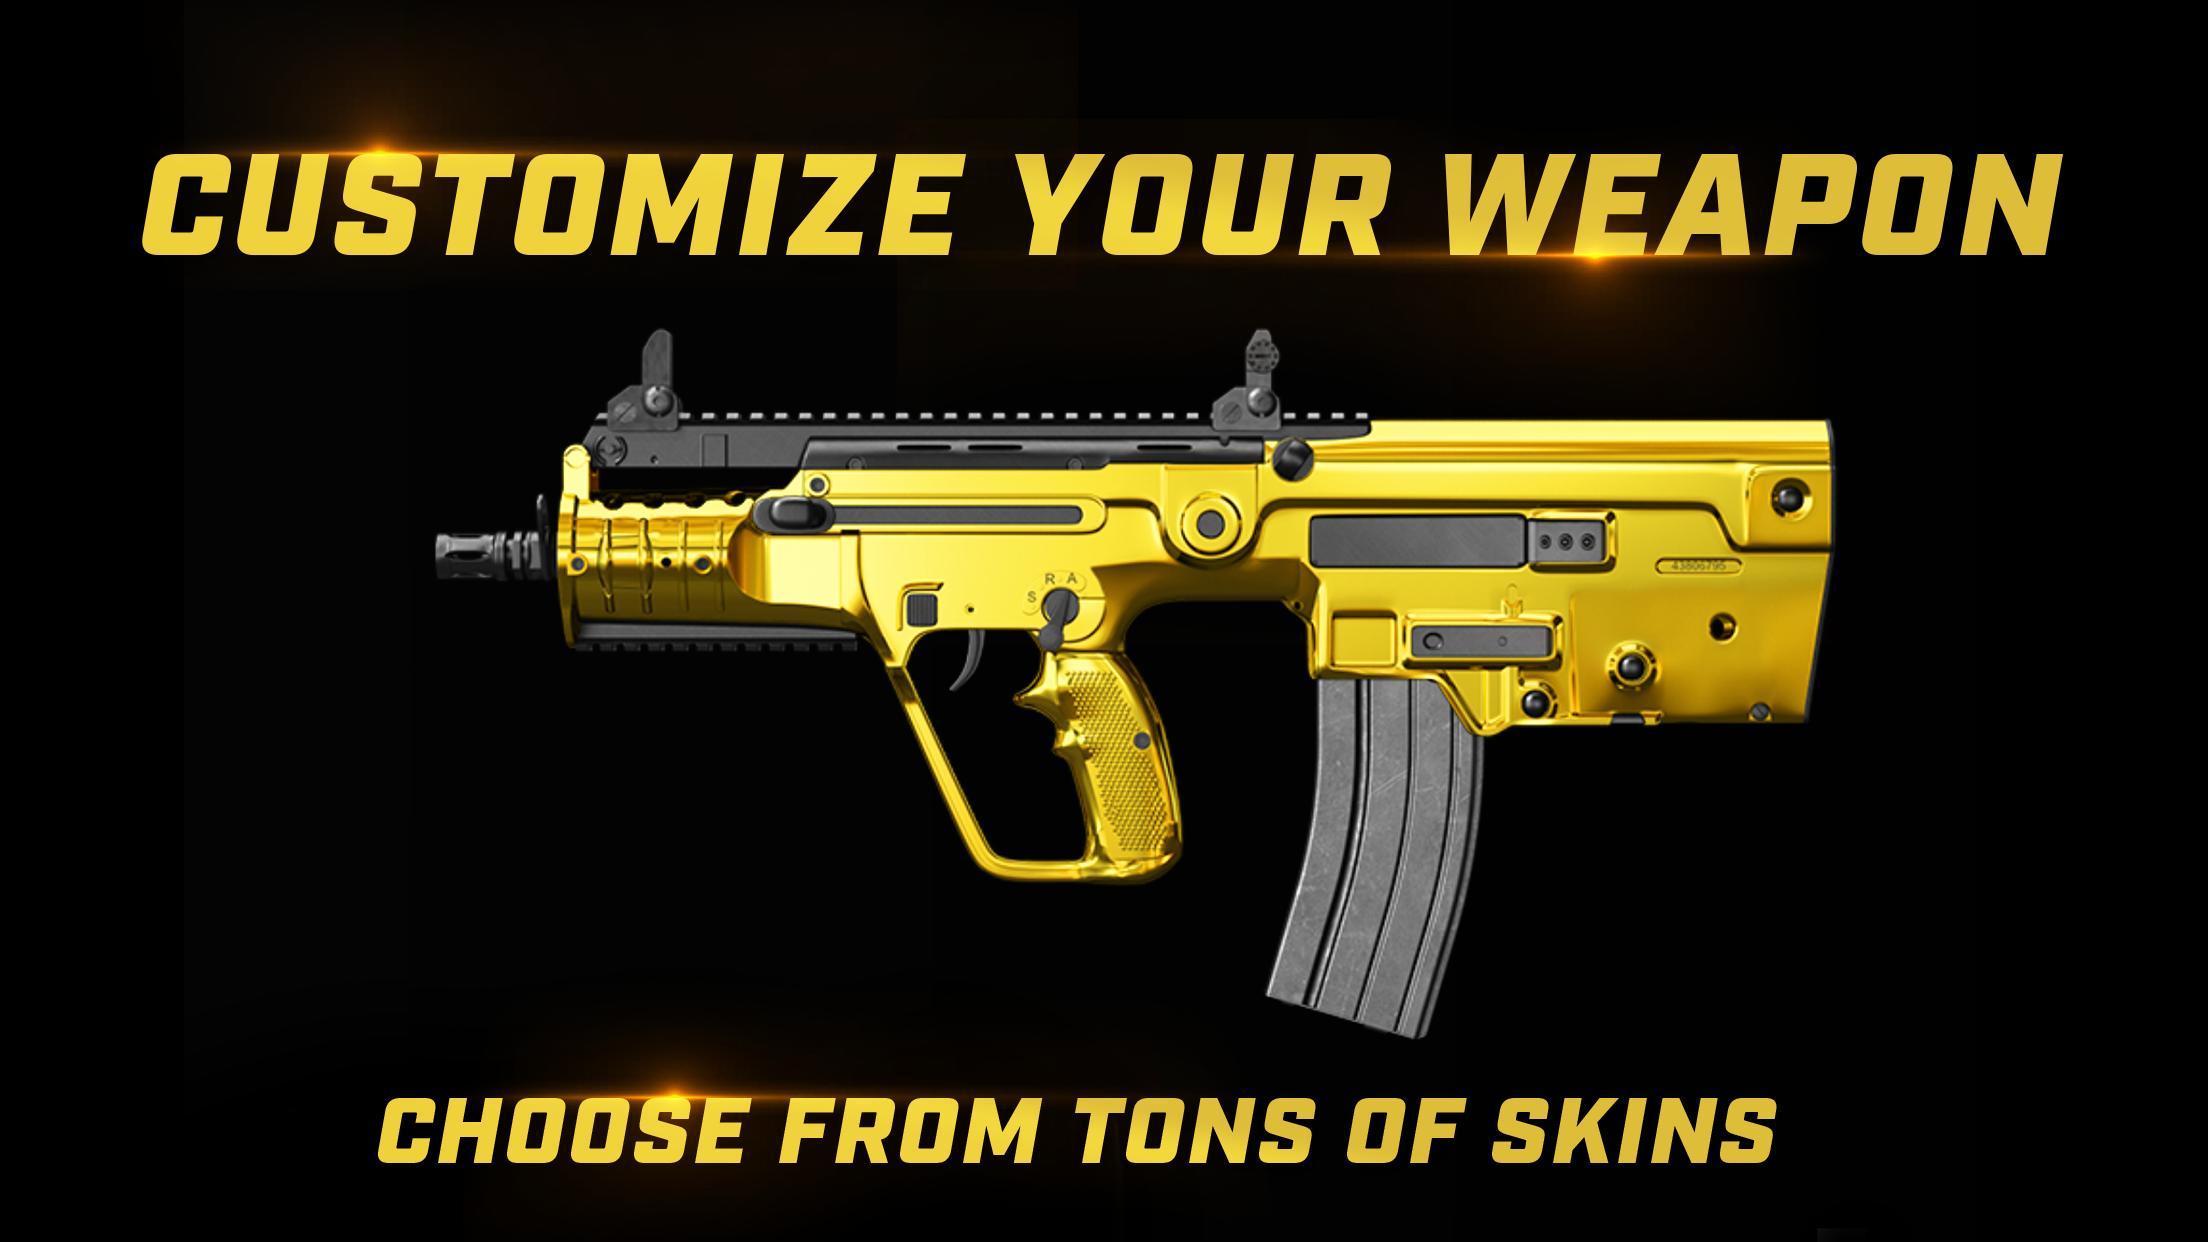 iGun Pro The Original Gun App 5.26 Screenshot 4